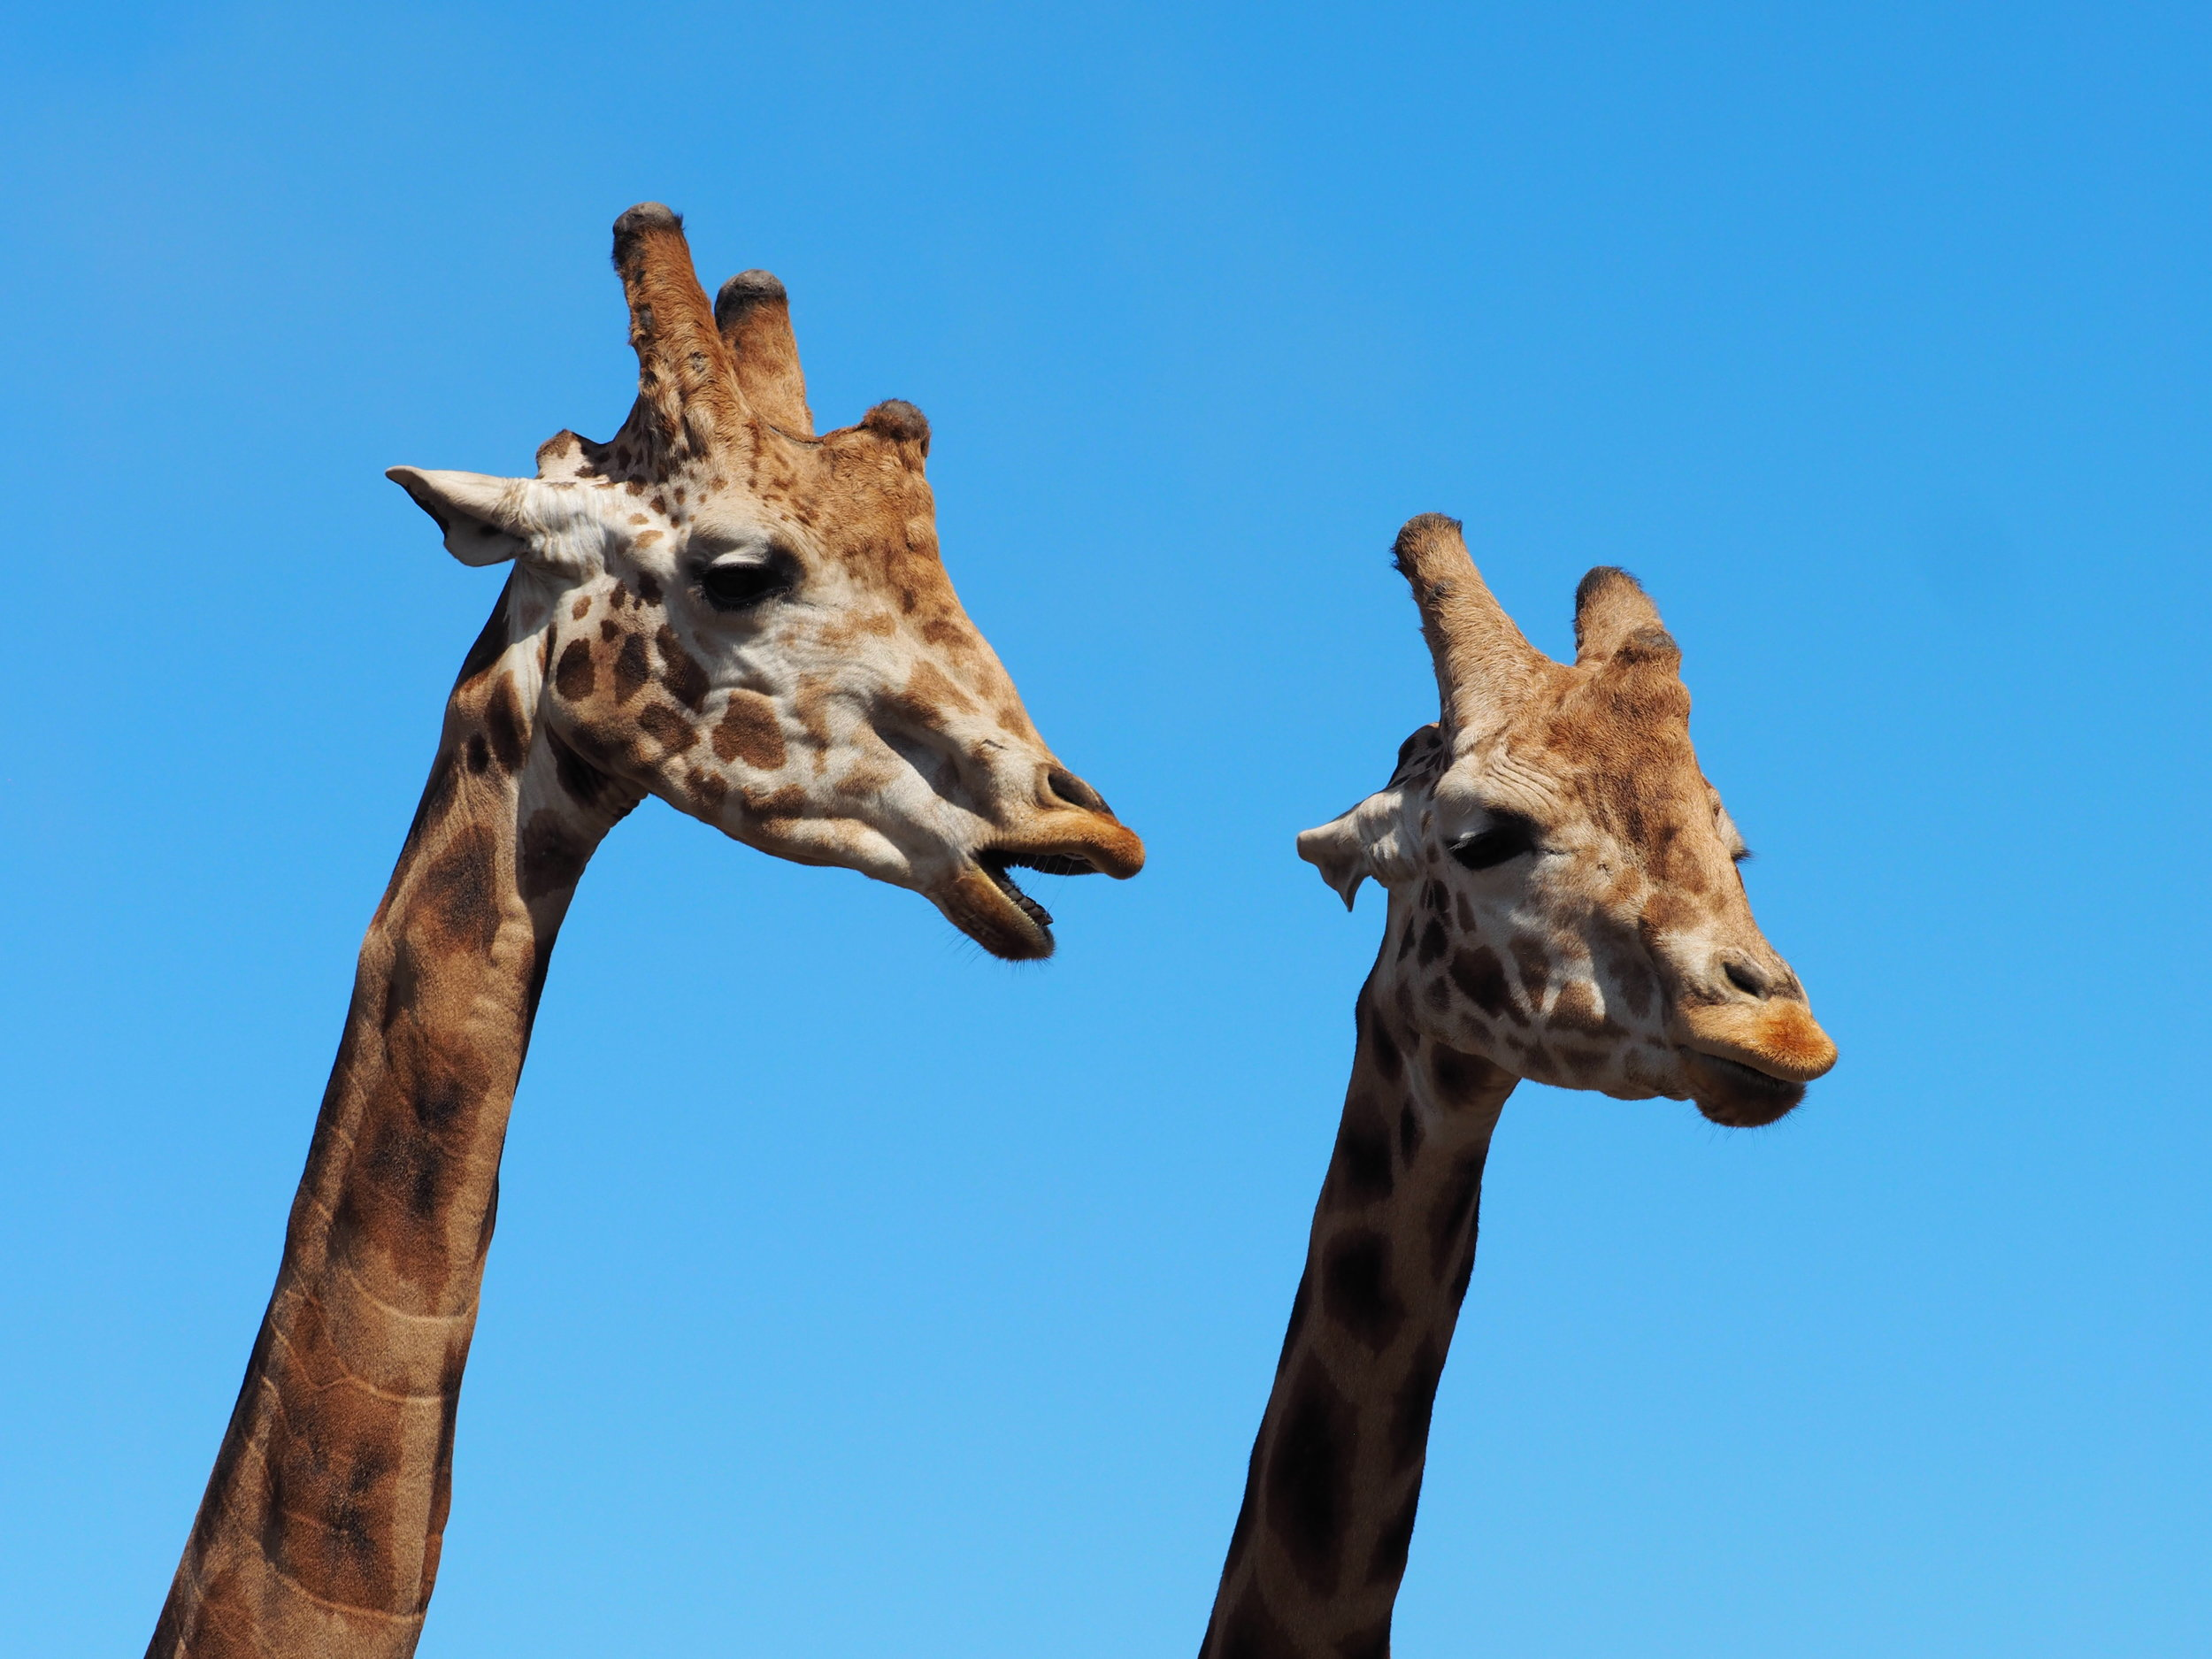 Rothschild's Giraffe, Endangered. (Juvenile Male Half-Brothers) B Bryan Preserve, Point Arena, CA